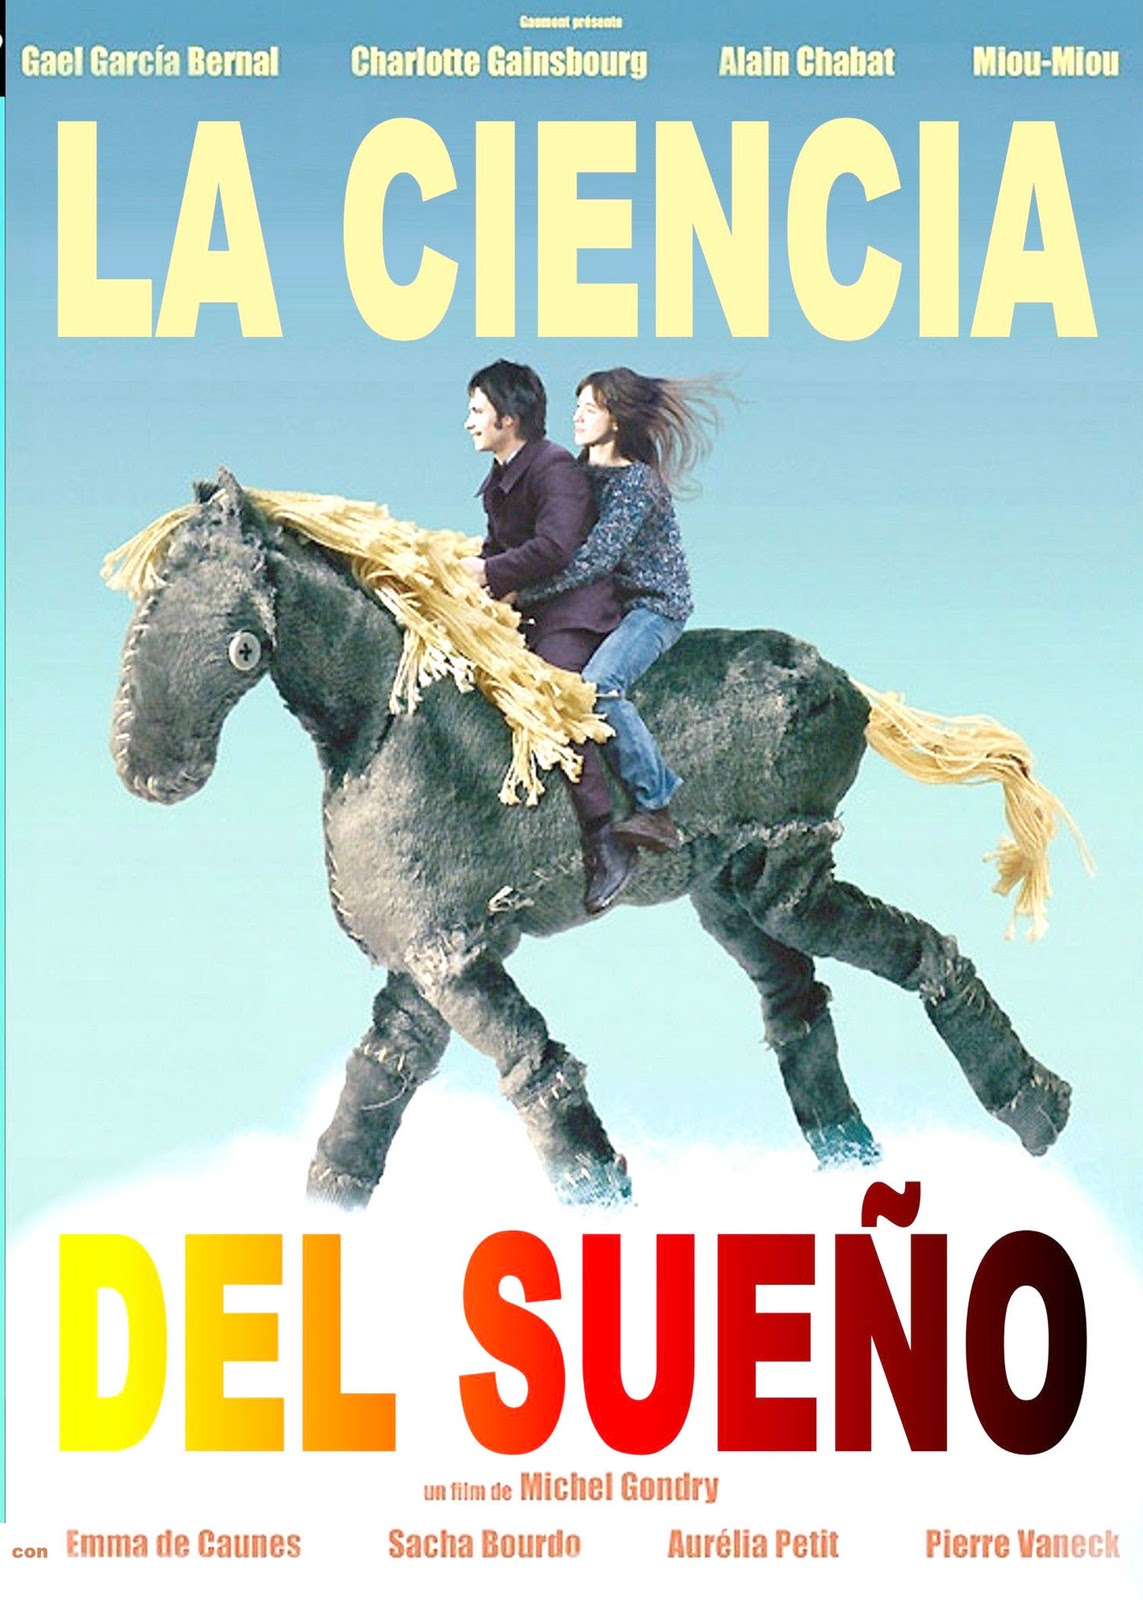 http://3.bp.blogspot.com/-FThFus_LvNw/TvHKYVBNPKI/AAAAAAAAApQ/lTaAAhEp4xY/s1600/La+Ciencia+Del+Sue%25C3%25B1o.jpg